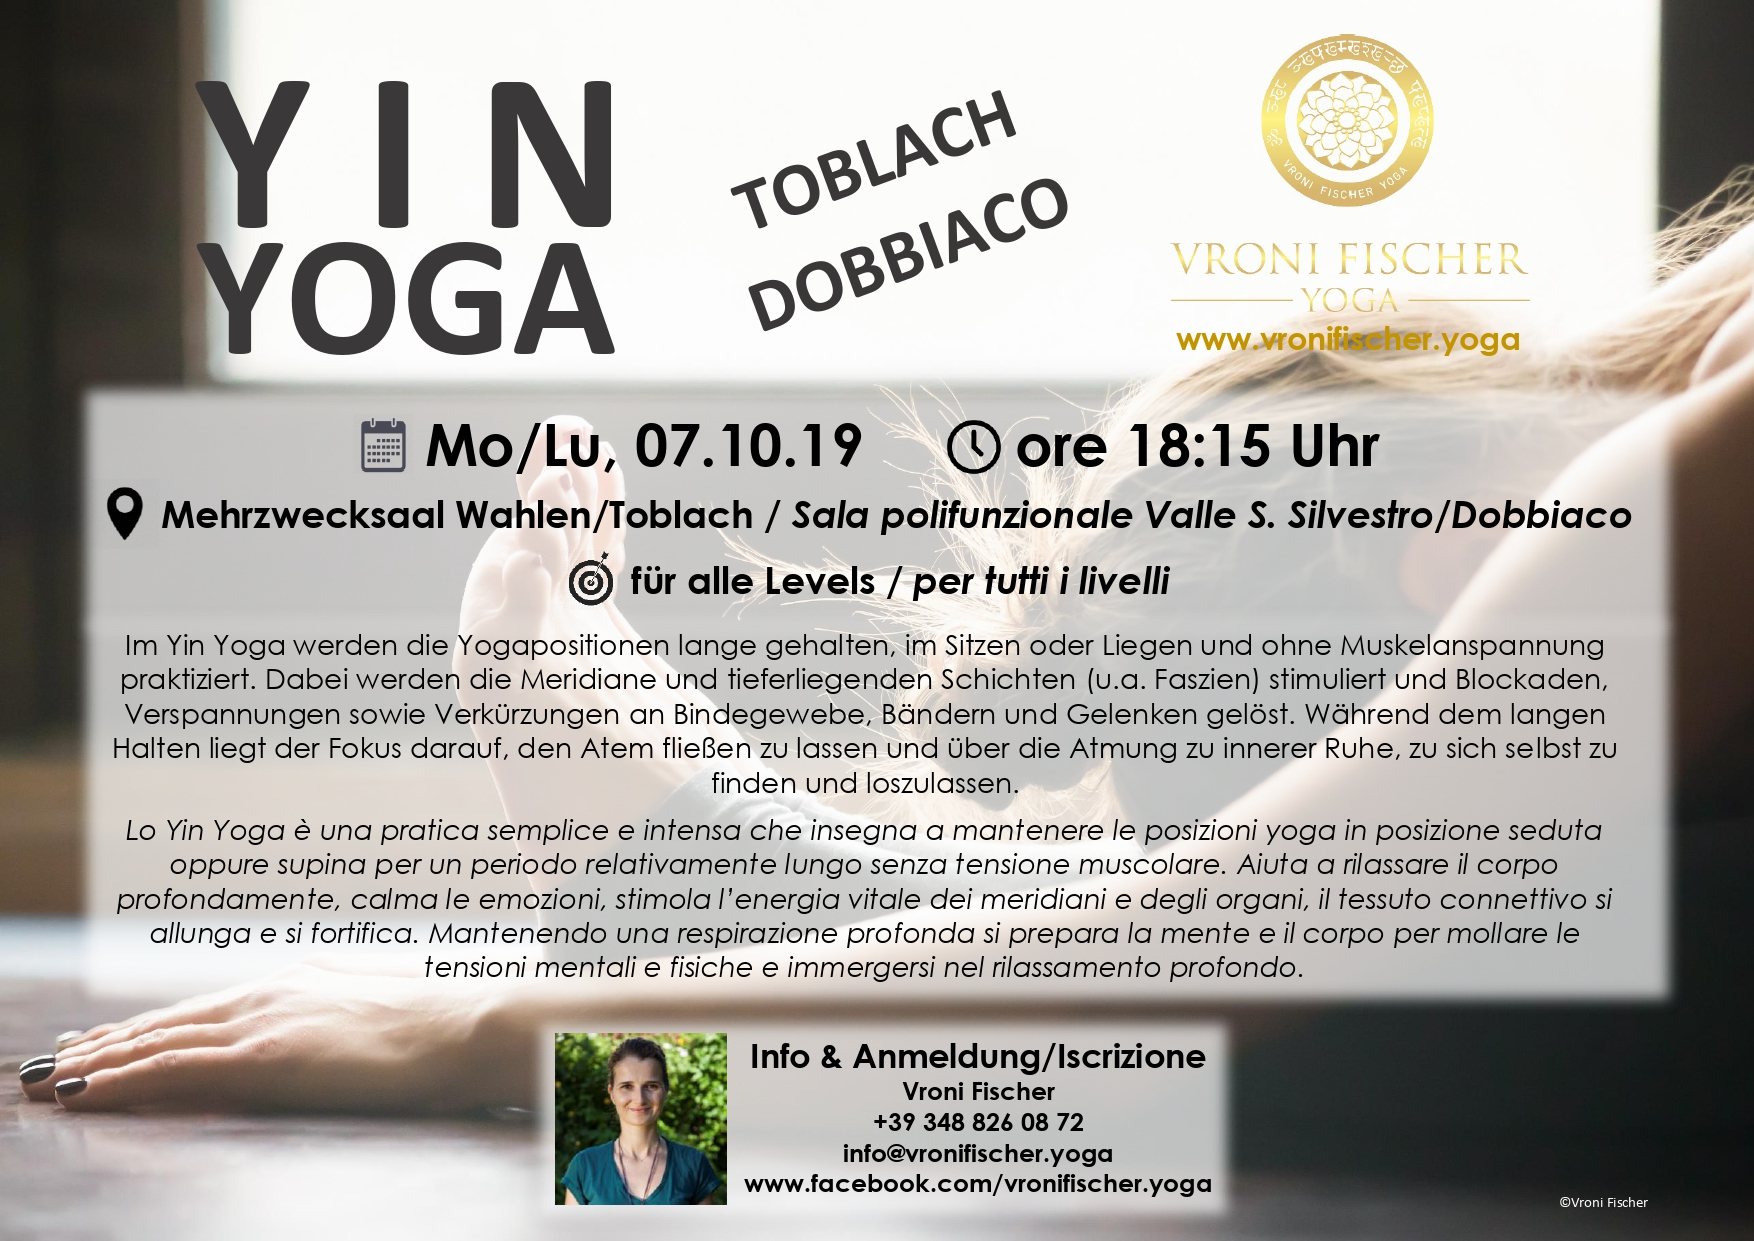 https://www.vronifischer.yoga/kurse-corsi/toblach-dobbiaco/